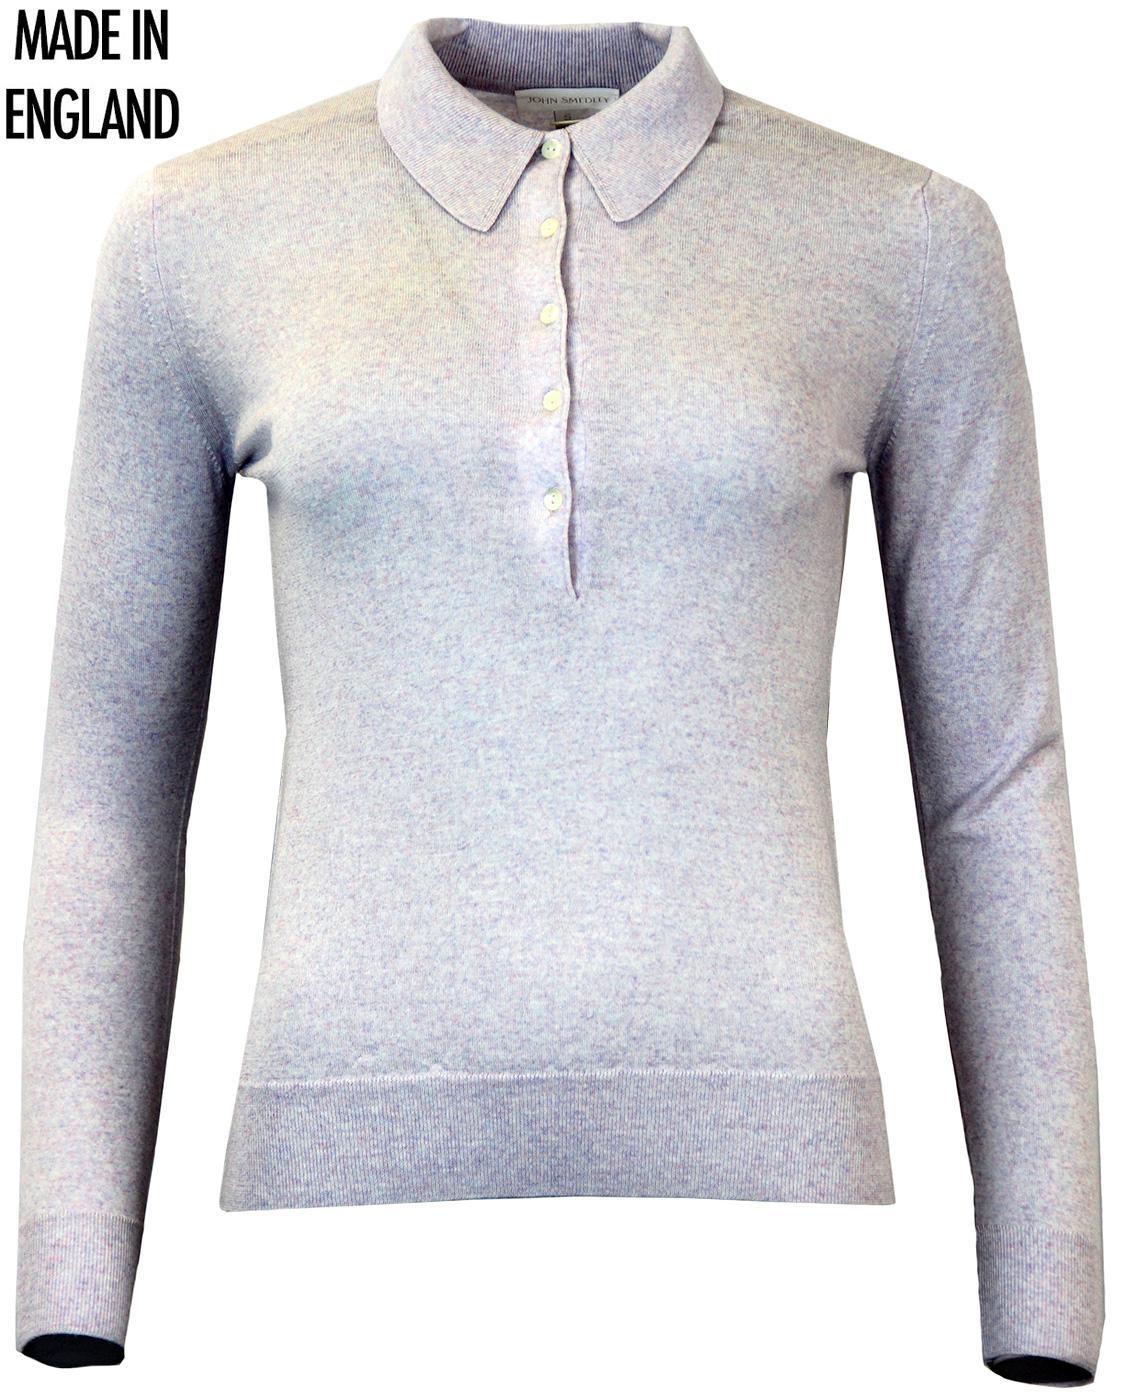 Agatha JOHN SMEDLEY Retro 60s Mod Knitted Polo Top